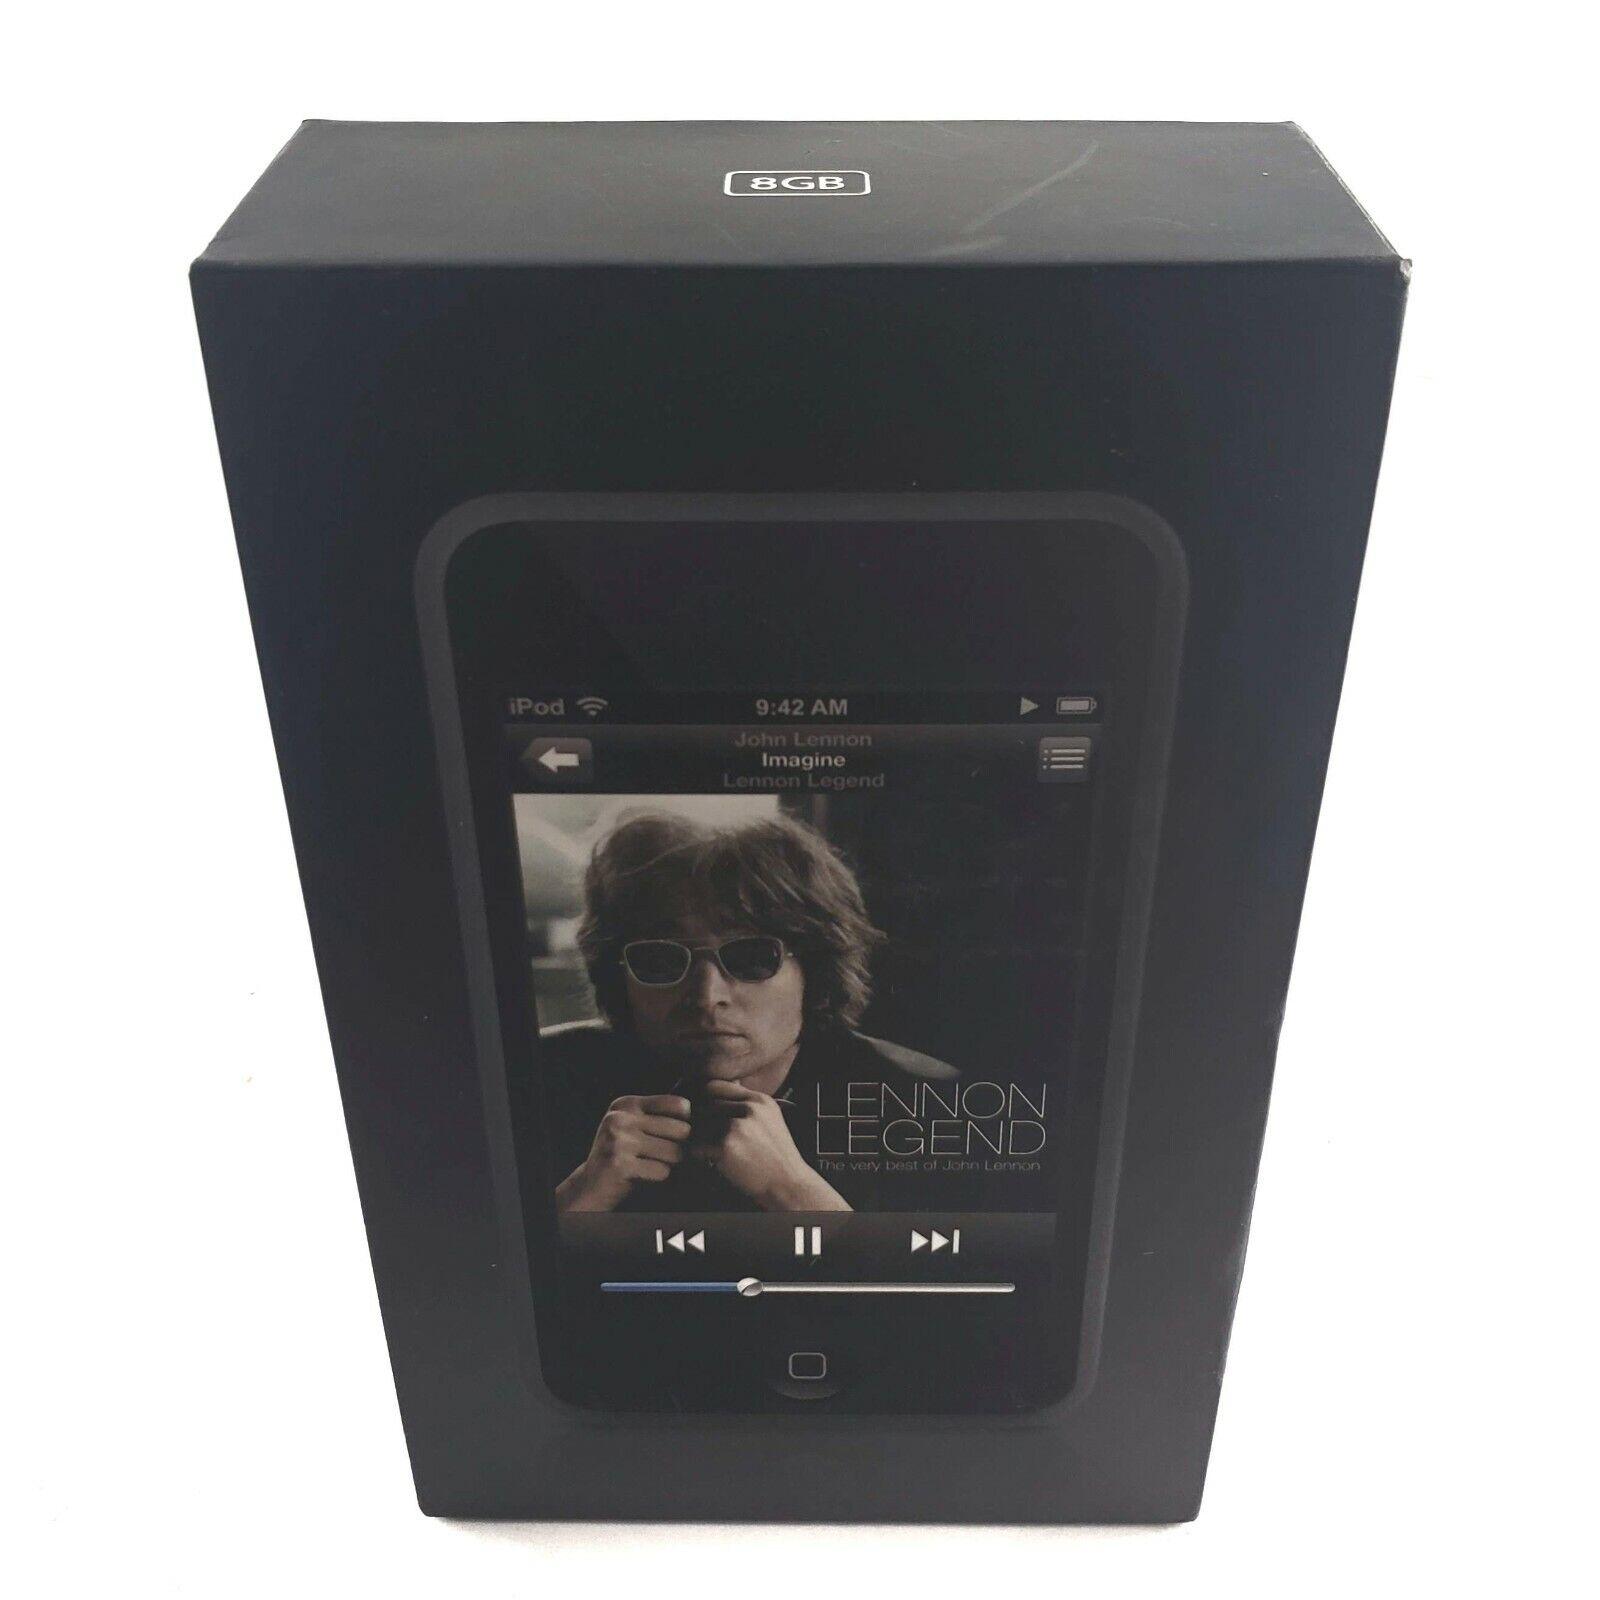 EMPTY BOX Apple iPod Touch 16GB MA627LL/B Model A1213 NO iPOD john lennon legend